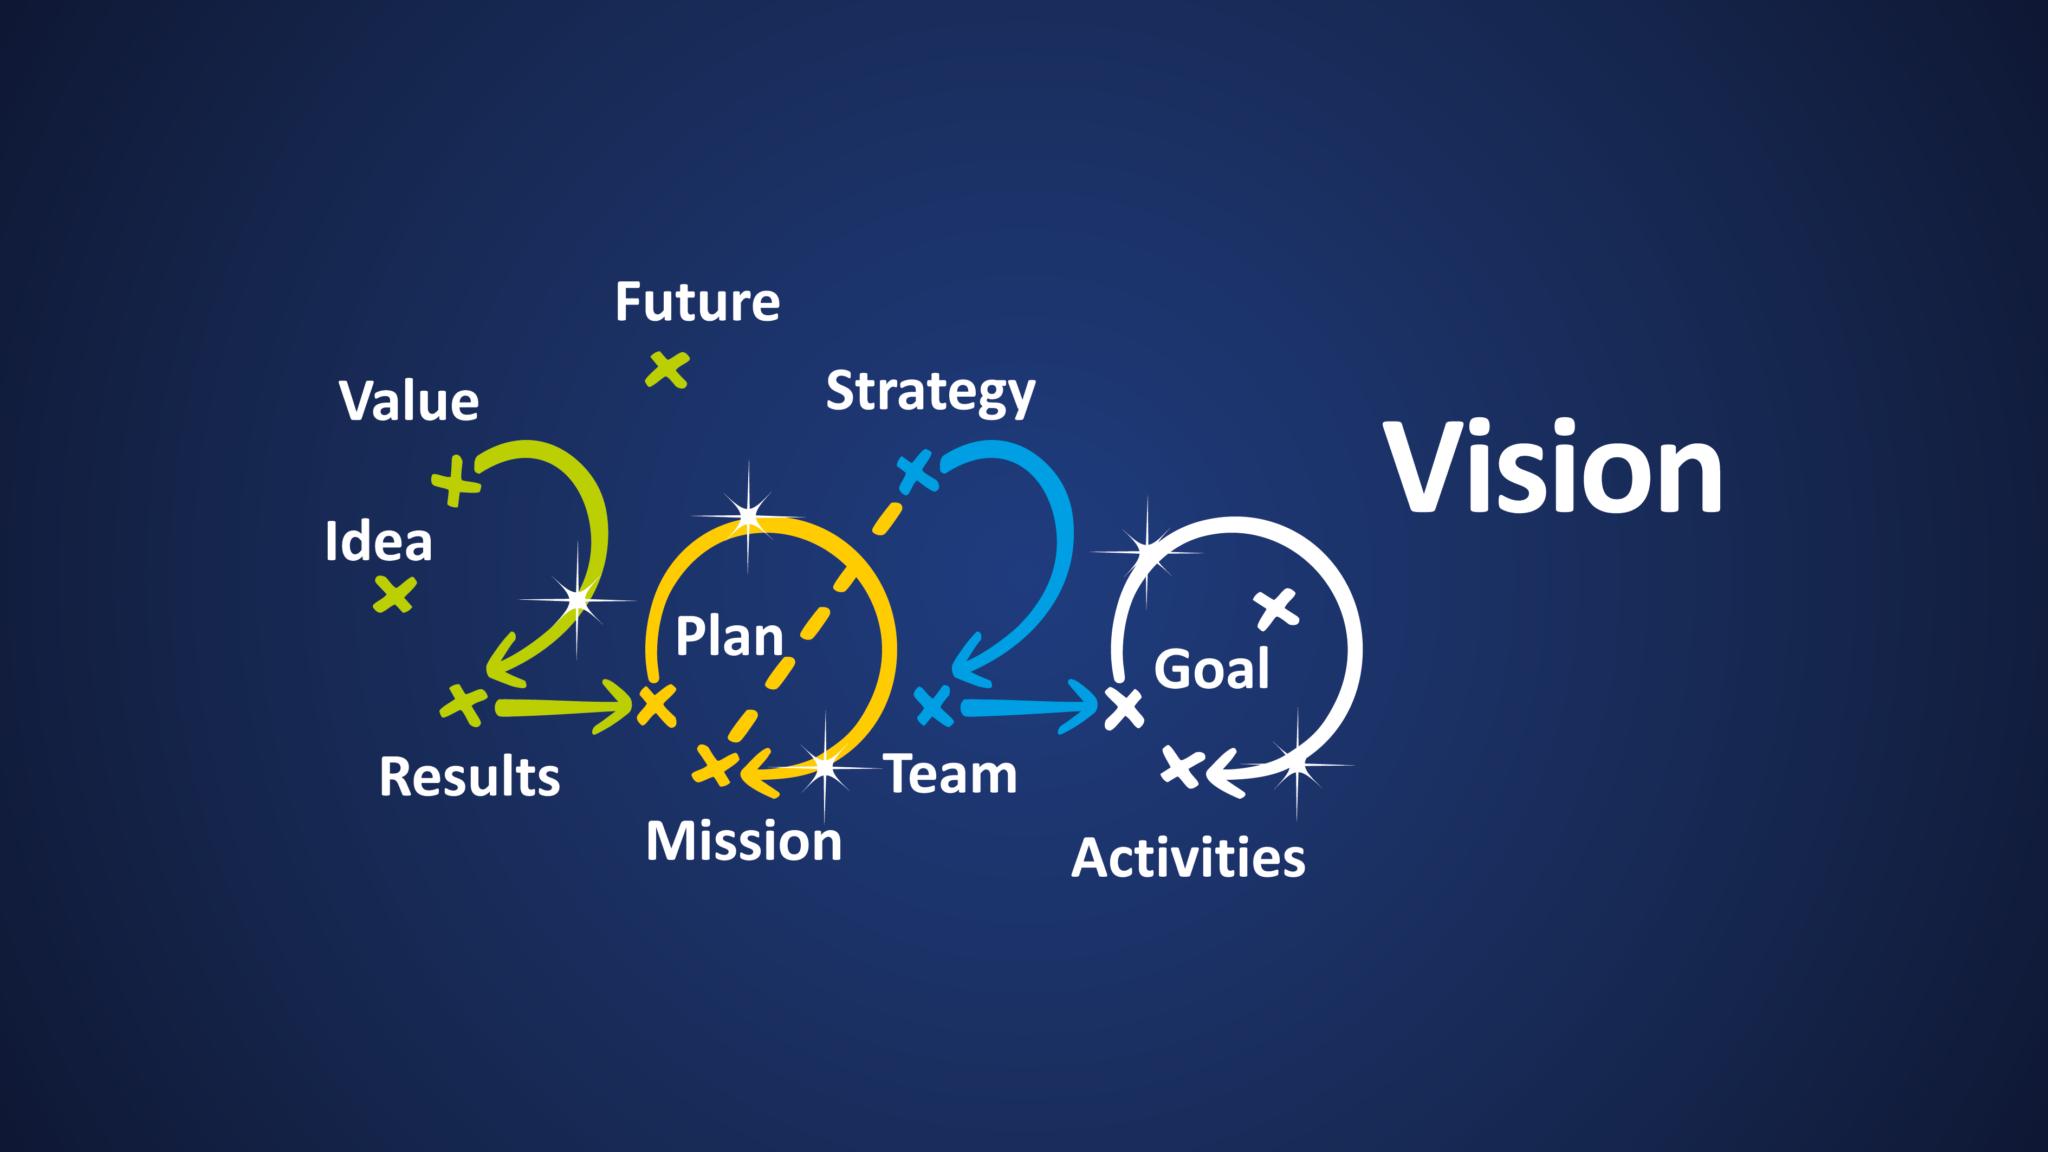 Lean-Agile Leadership Series – Post 3 – See The Vision